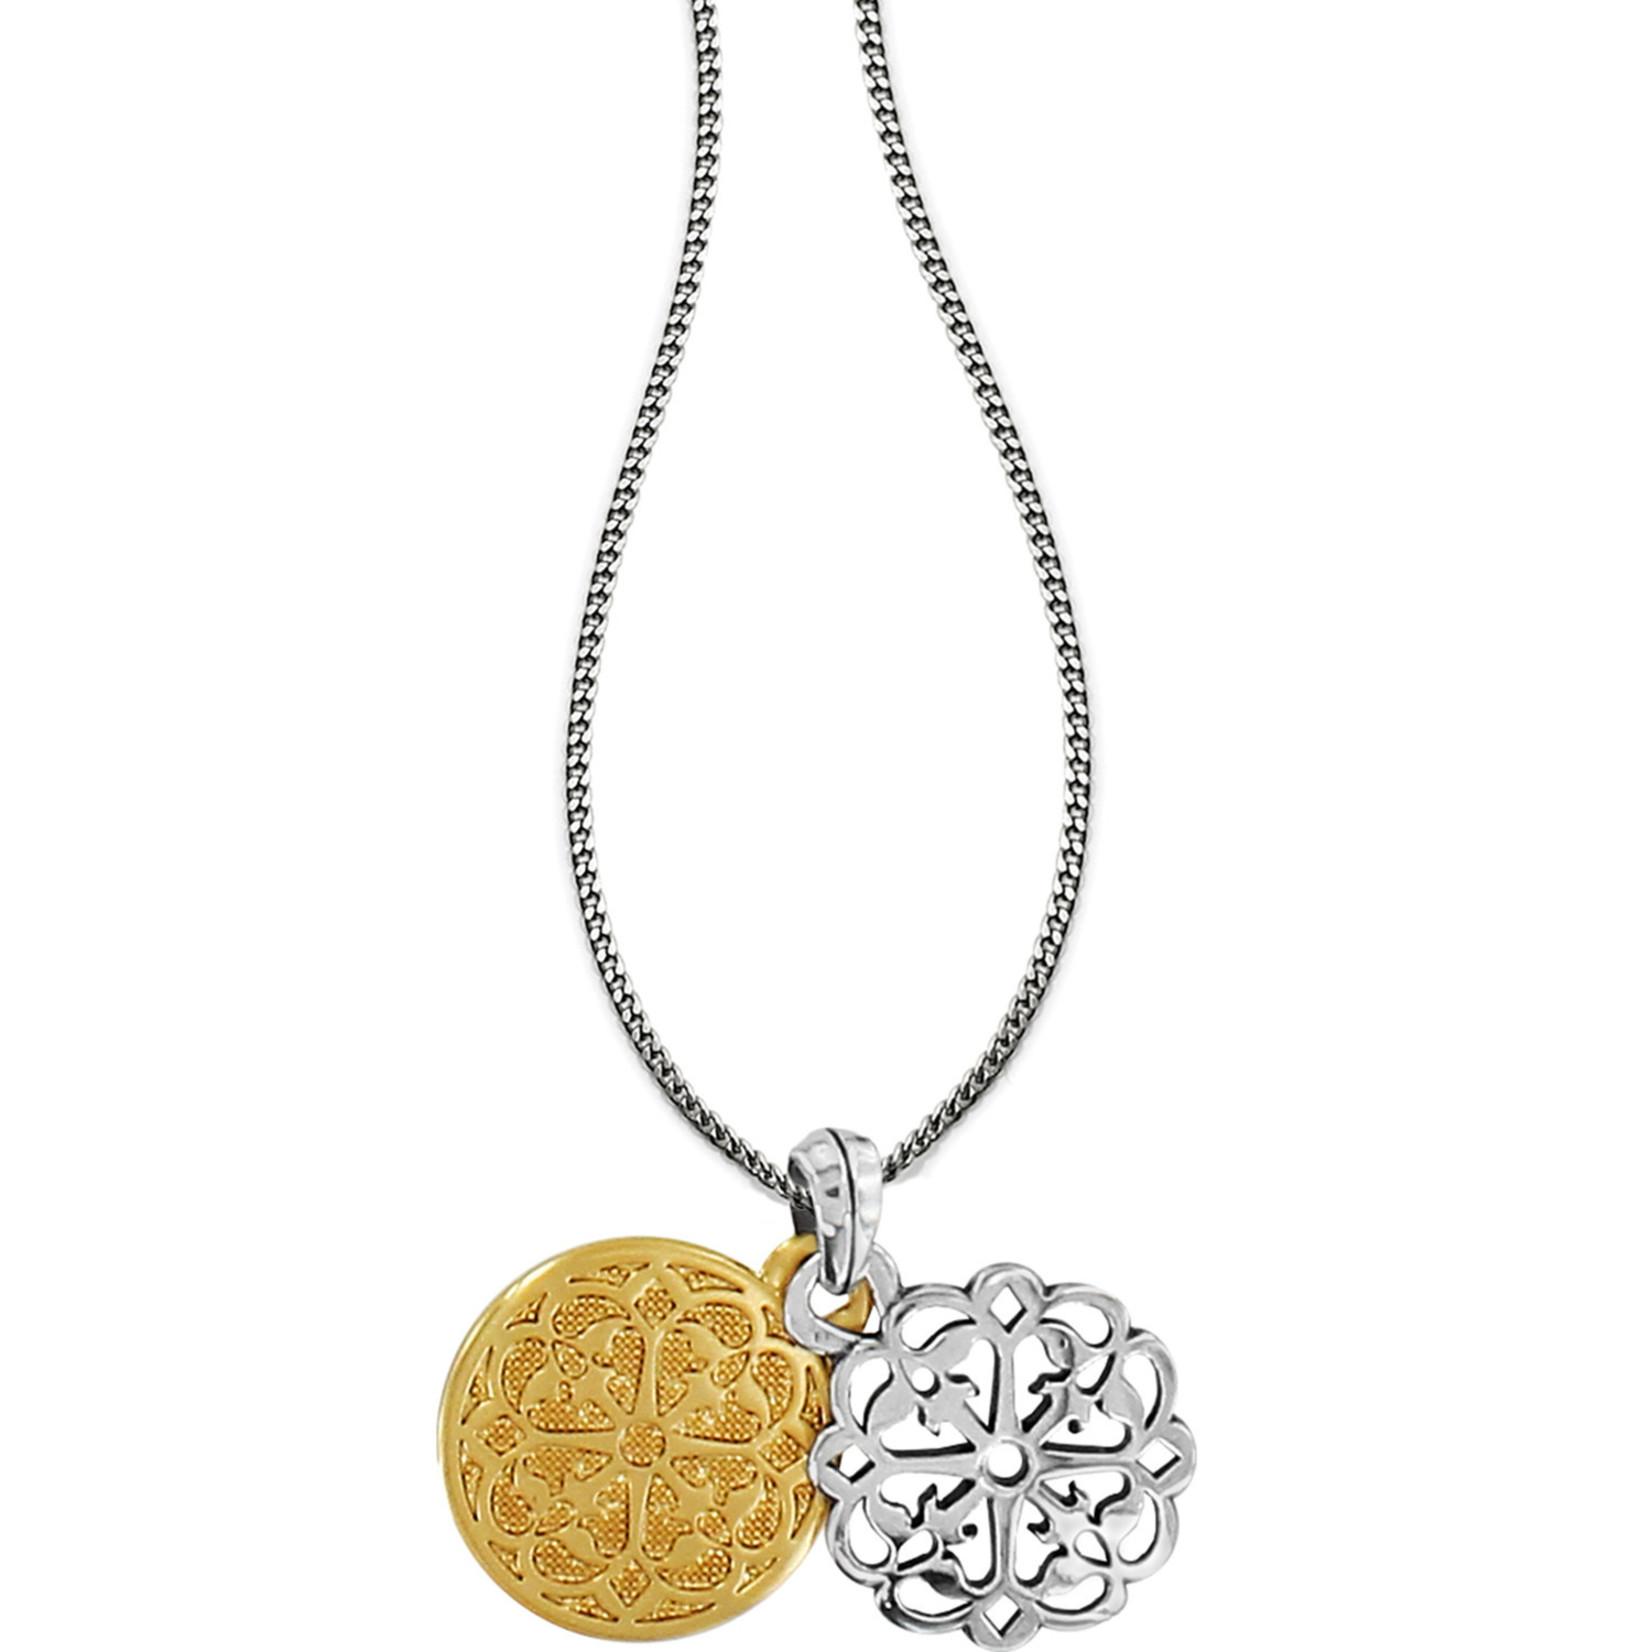 Brighton Ferrara Two Tone Reversible Long Necklace